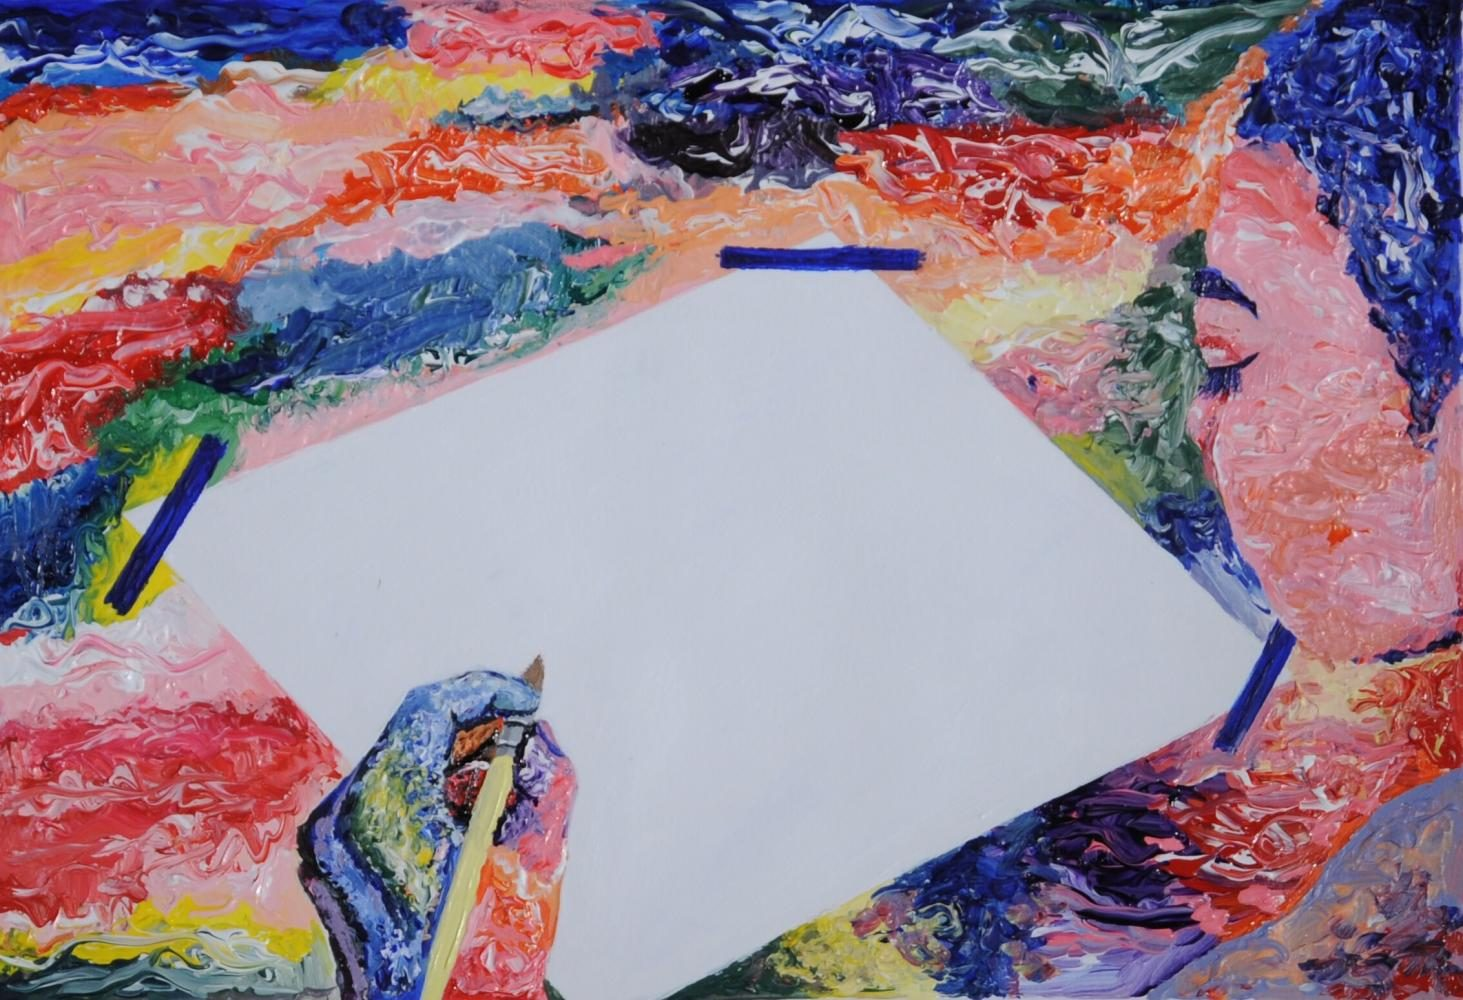 Artist Block  8.5 x 12.5 in Acrylic Paint